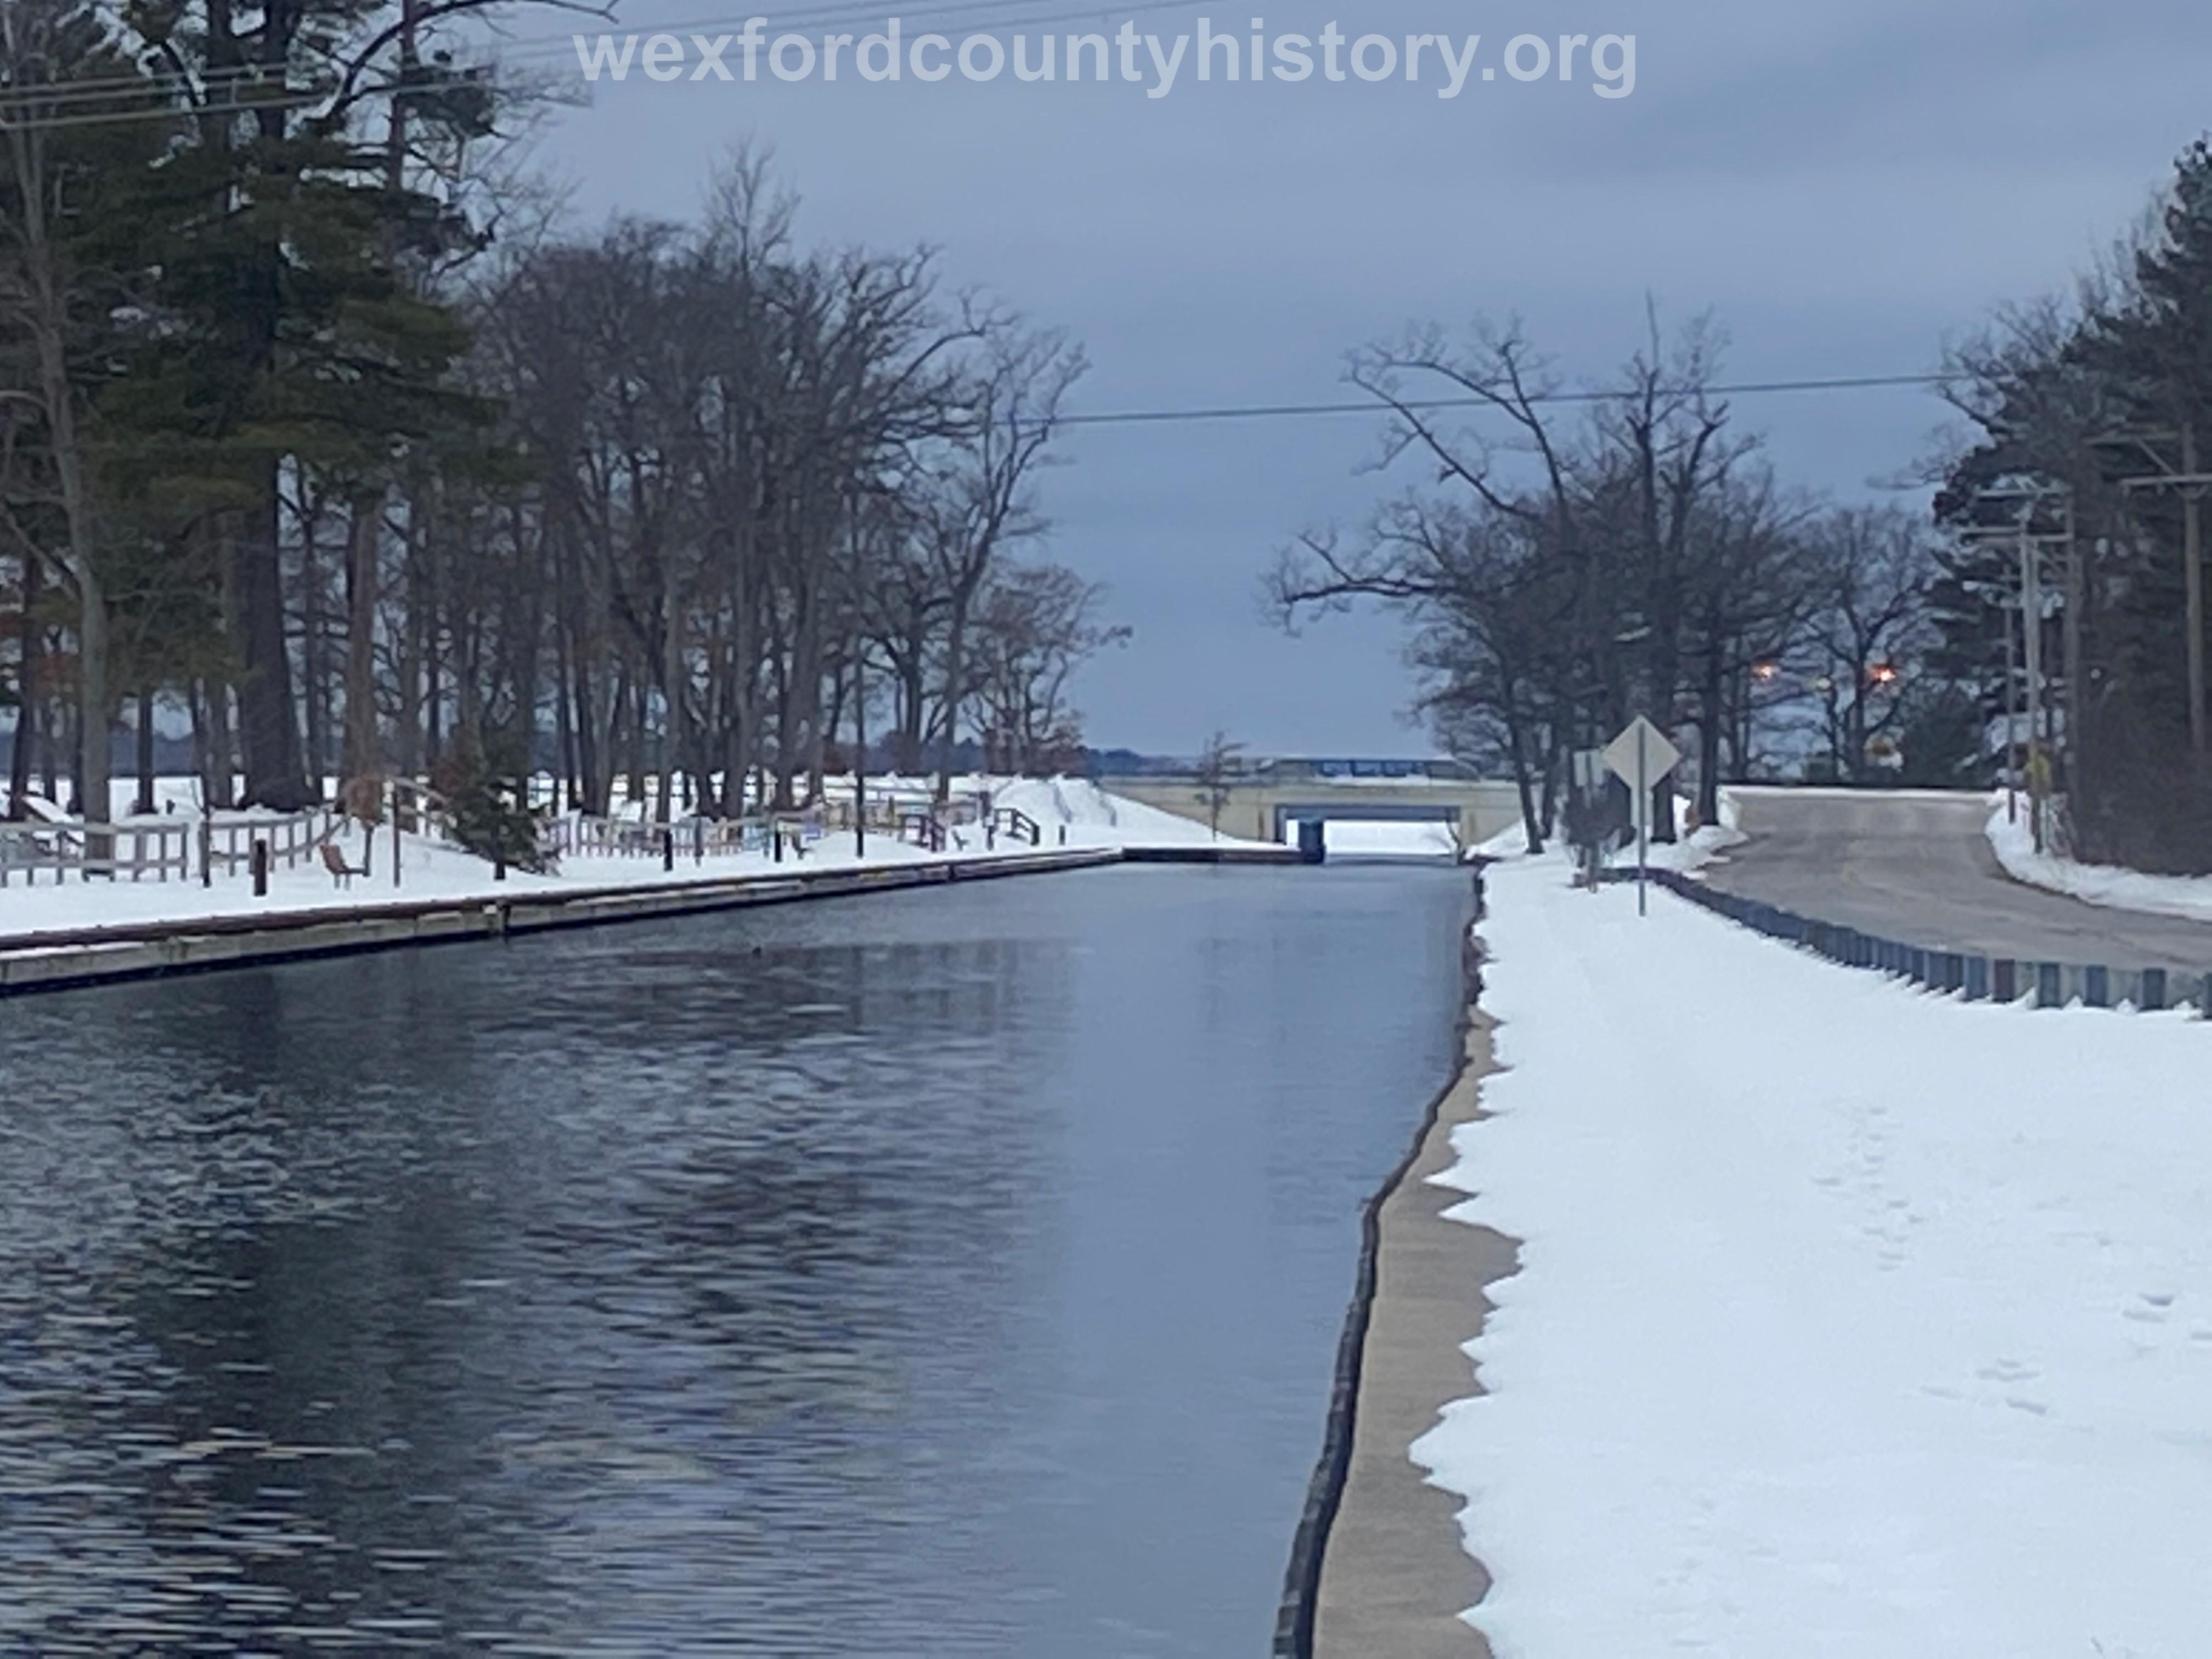 Cadillac-Recreation-The-Canal-January-29-2020-2